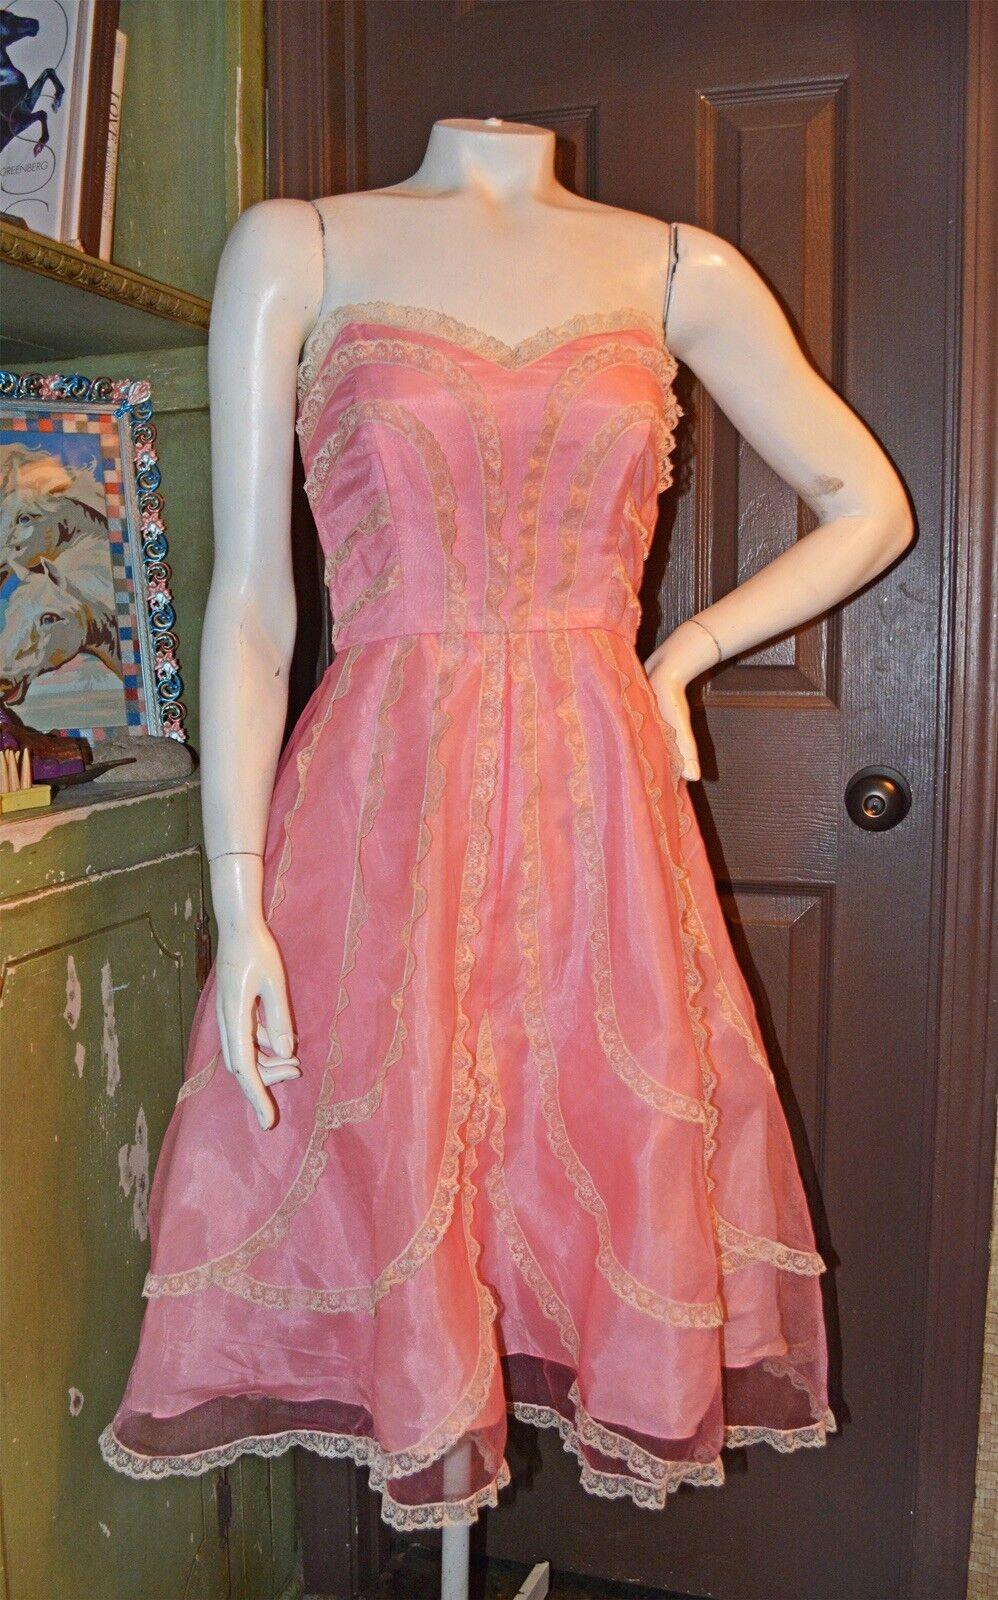 VINTAGE BETSY JOHNSON  RETRO 1950'S STYLE BABY Rosa PARTY DRESS W CRINOLINE   6